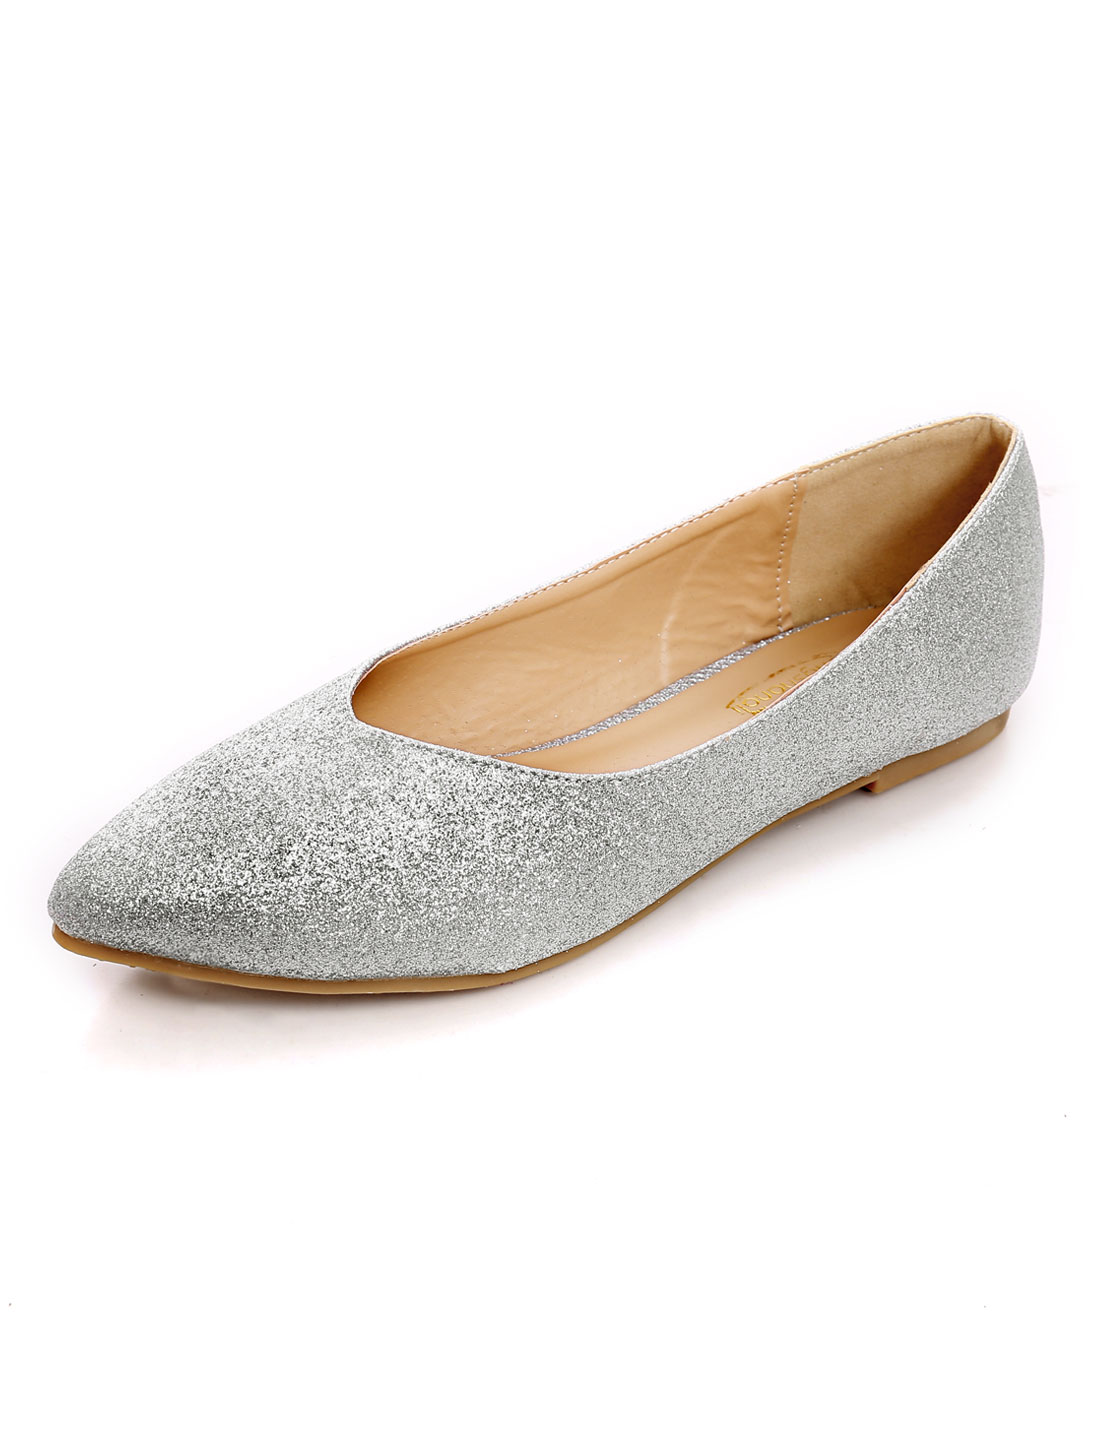 Women Slip On Shiny Decor Padded Outsole Flats Silver Tone US 10